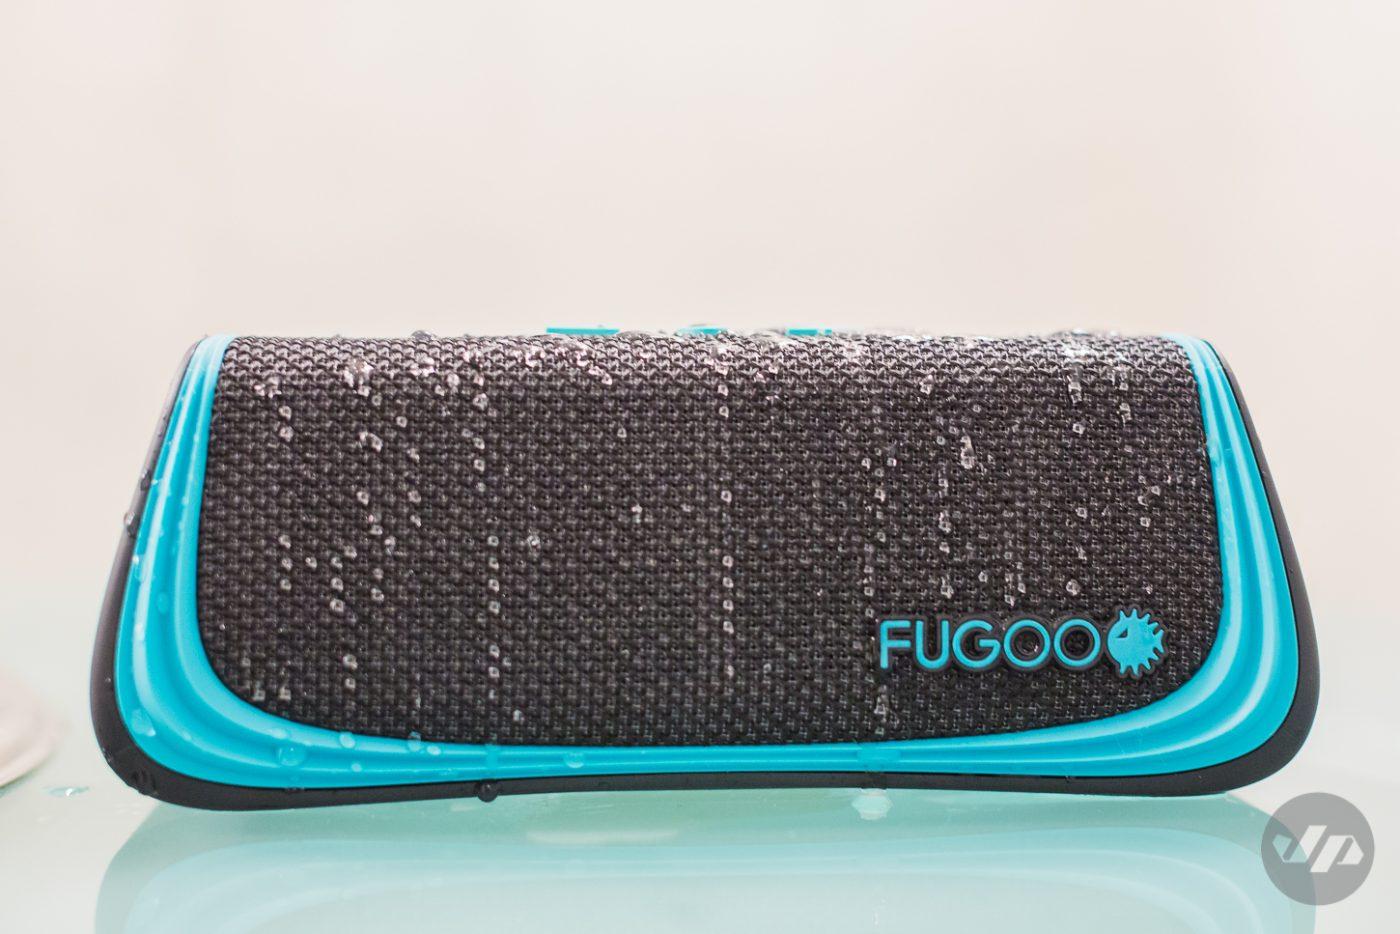 Fugoo-17